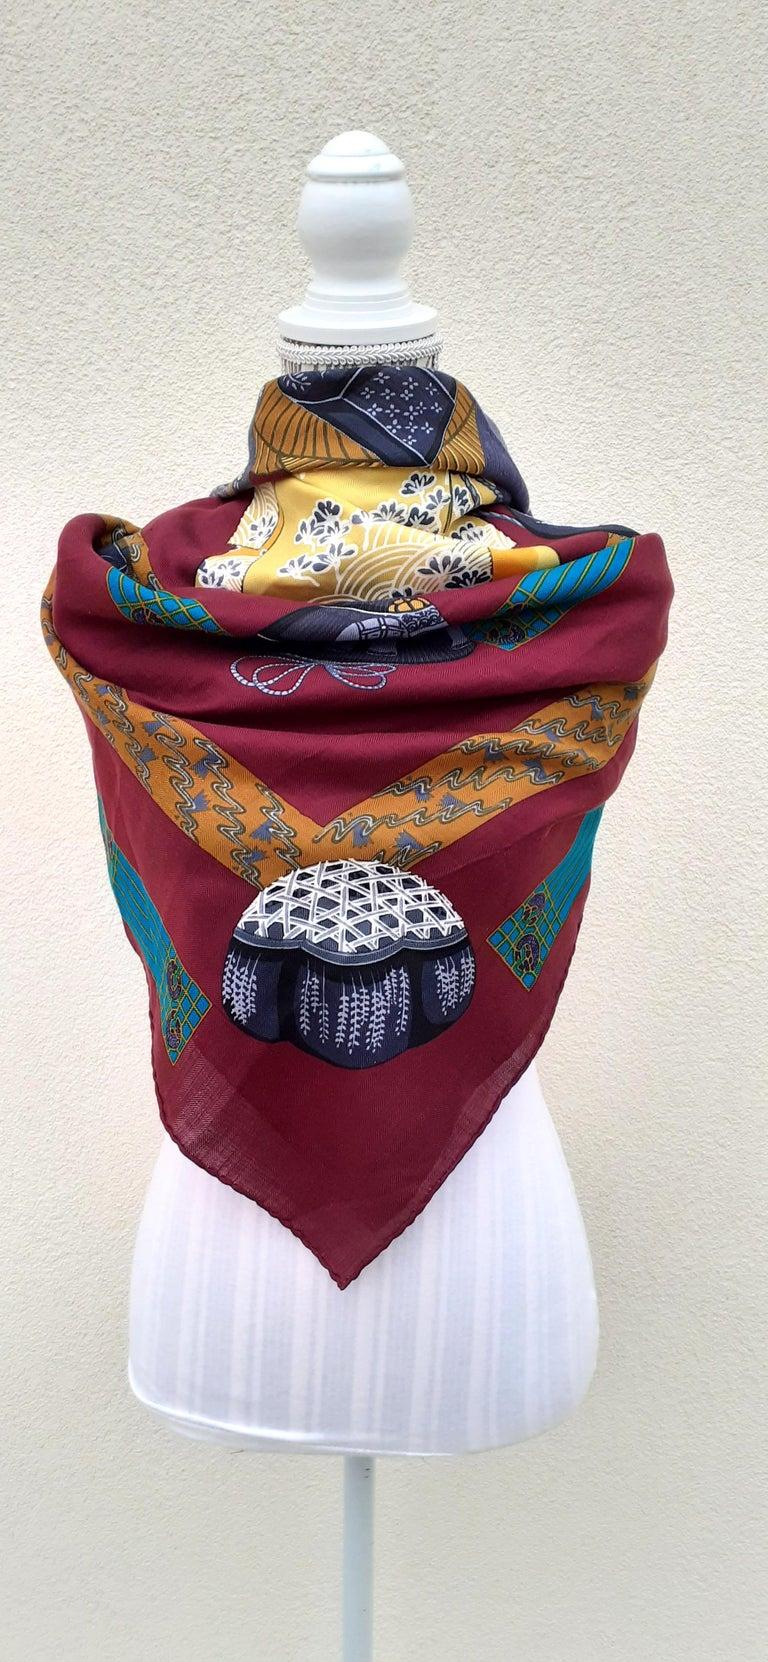 Hermès Shawl Scarf Kimonos et Inros Annie Faivre Cashmere Silk 54 inches For Sale 14